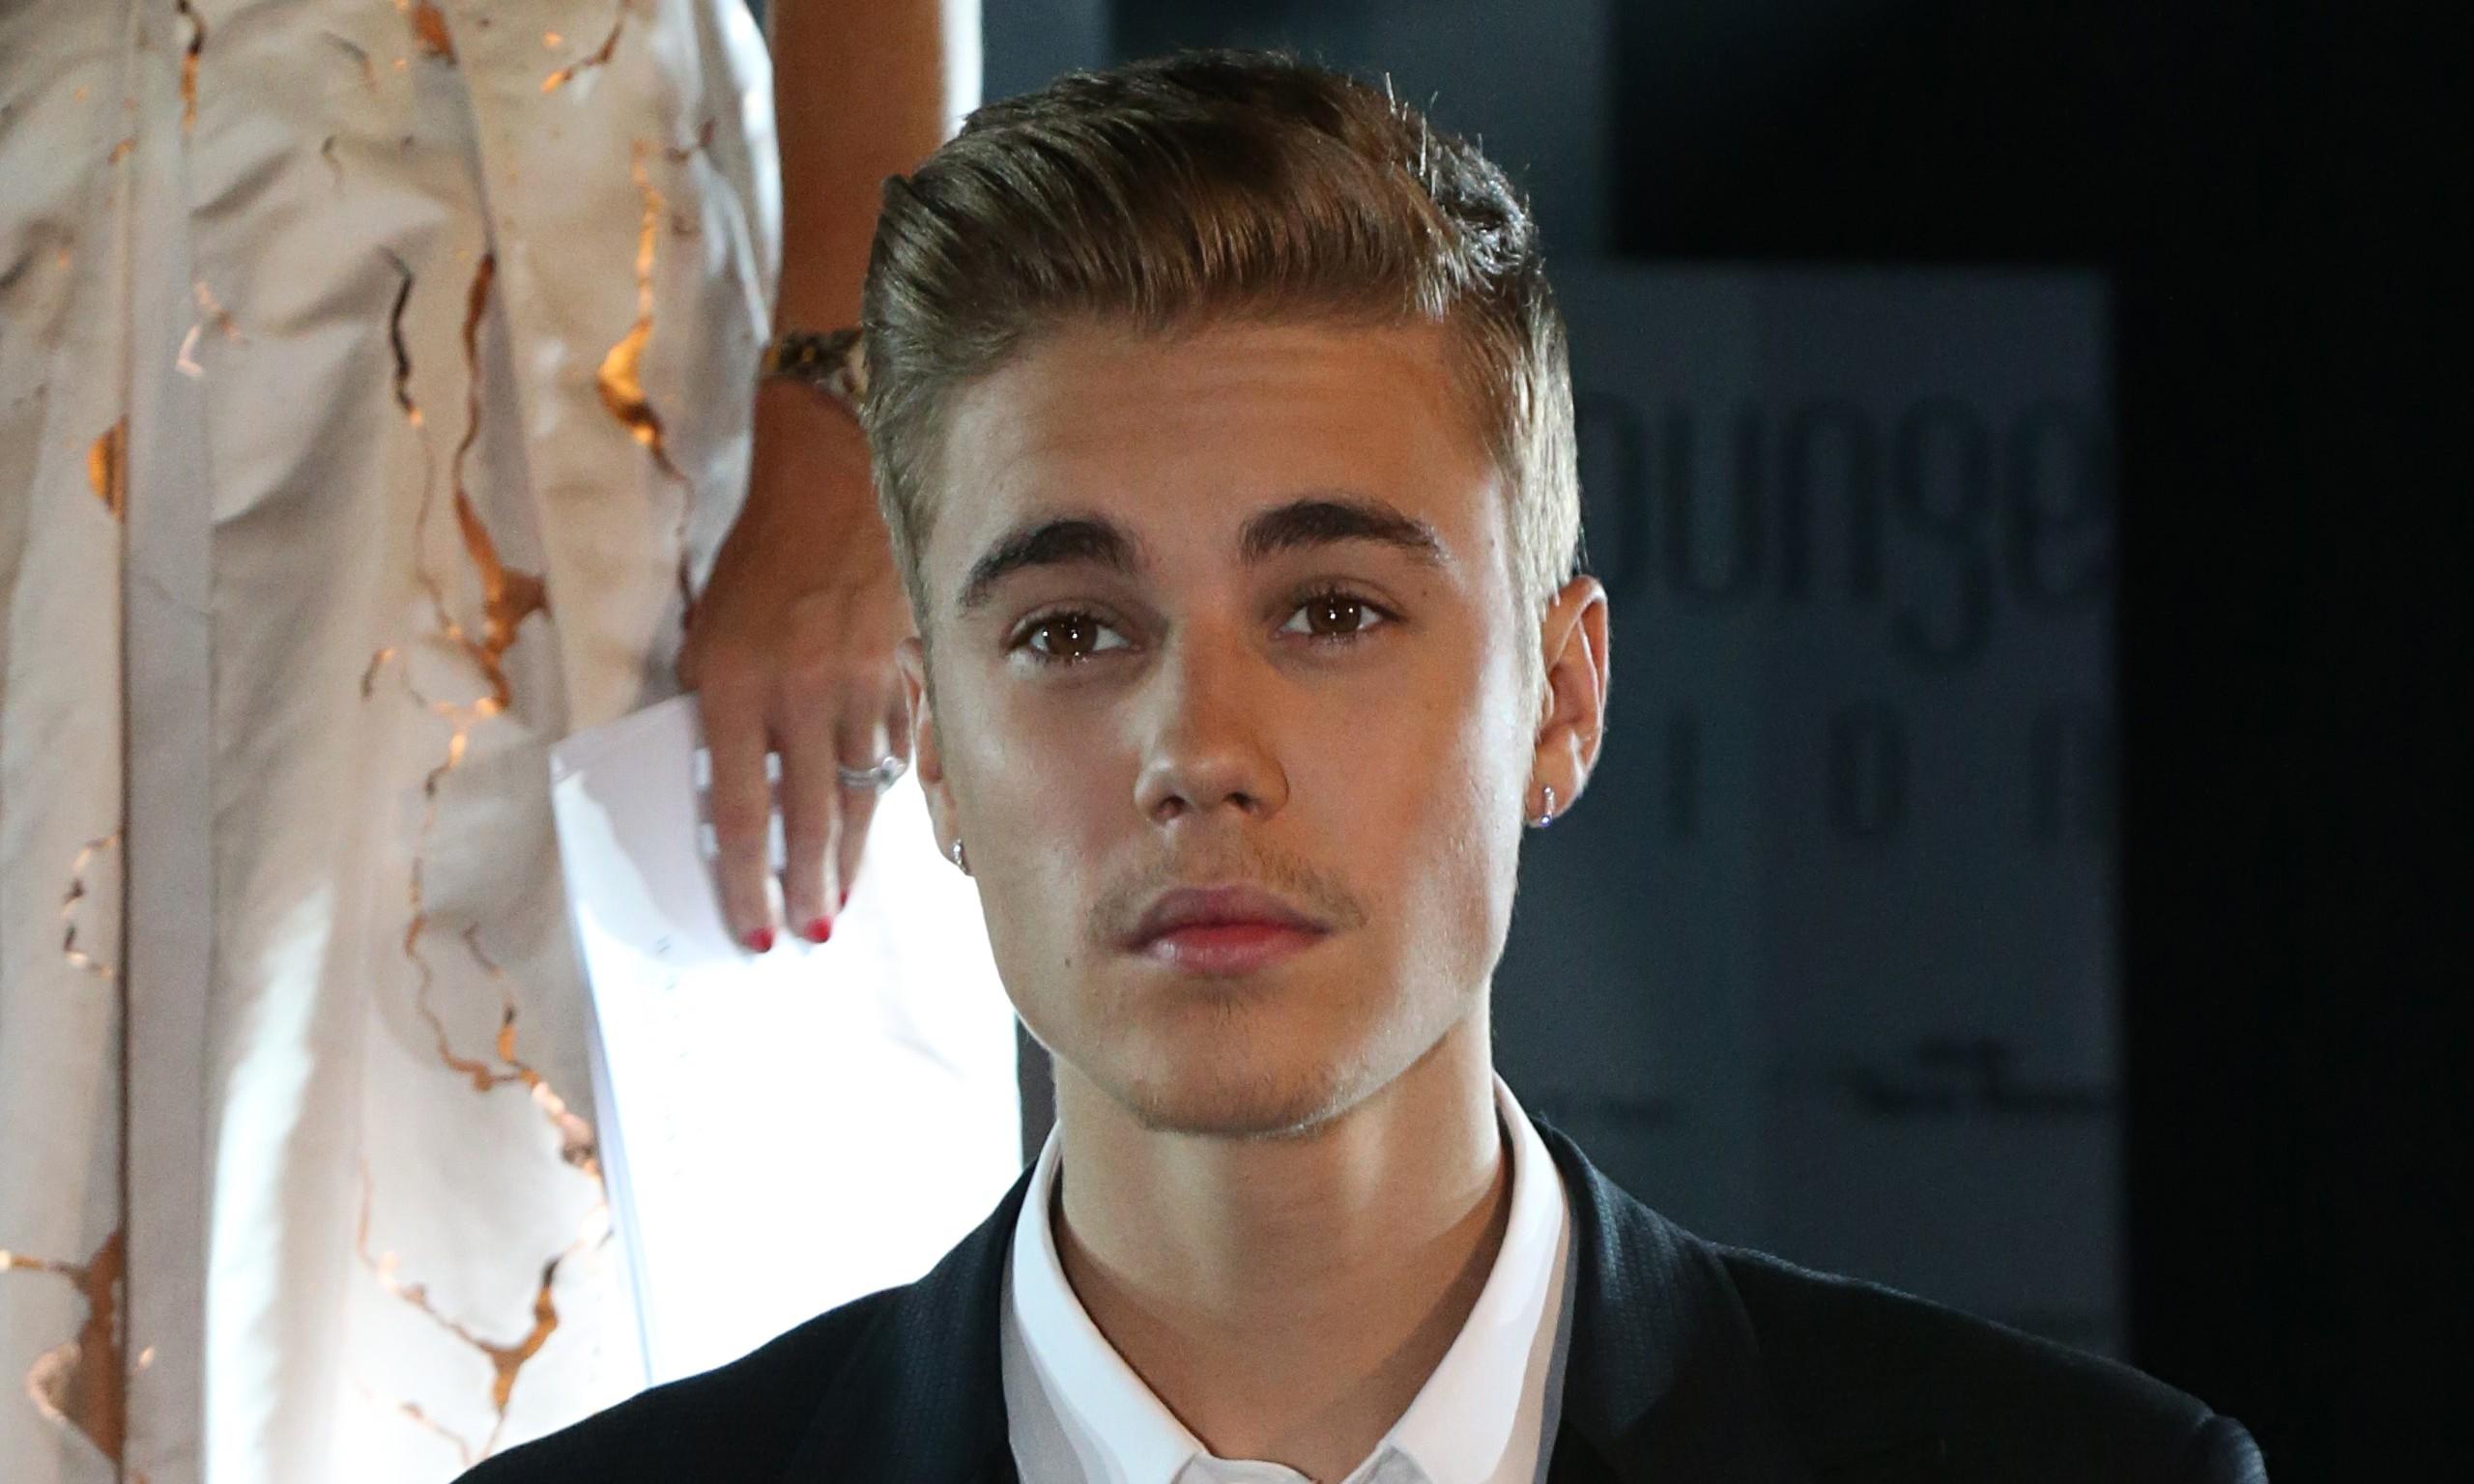 Justin Bieber Tumblr Backgrounds 2018 67 Images: Wallpapers Of Justin Bieber 2018 (60+ Images